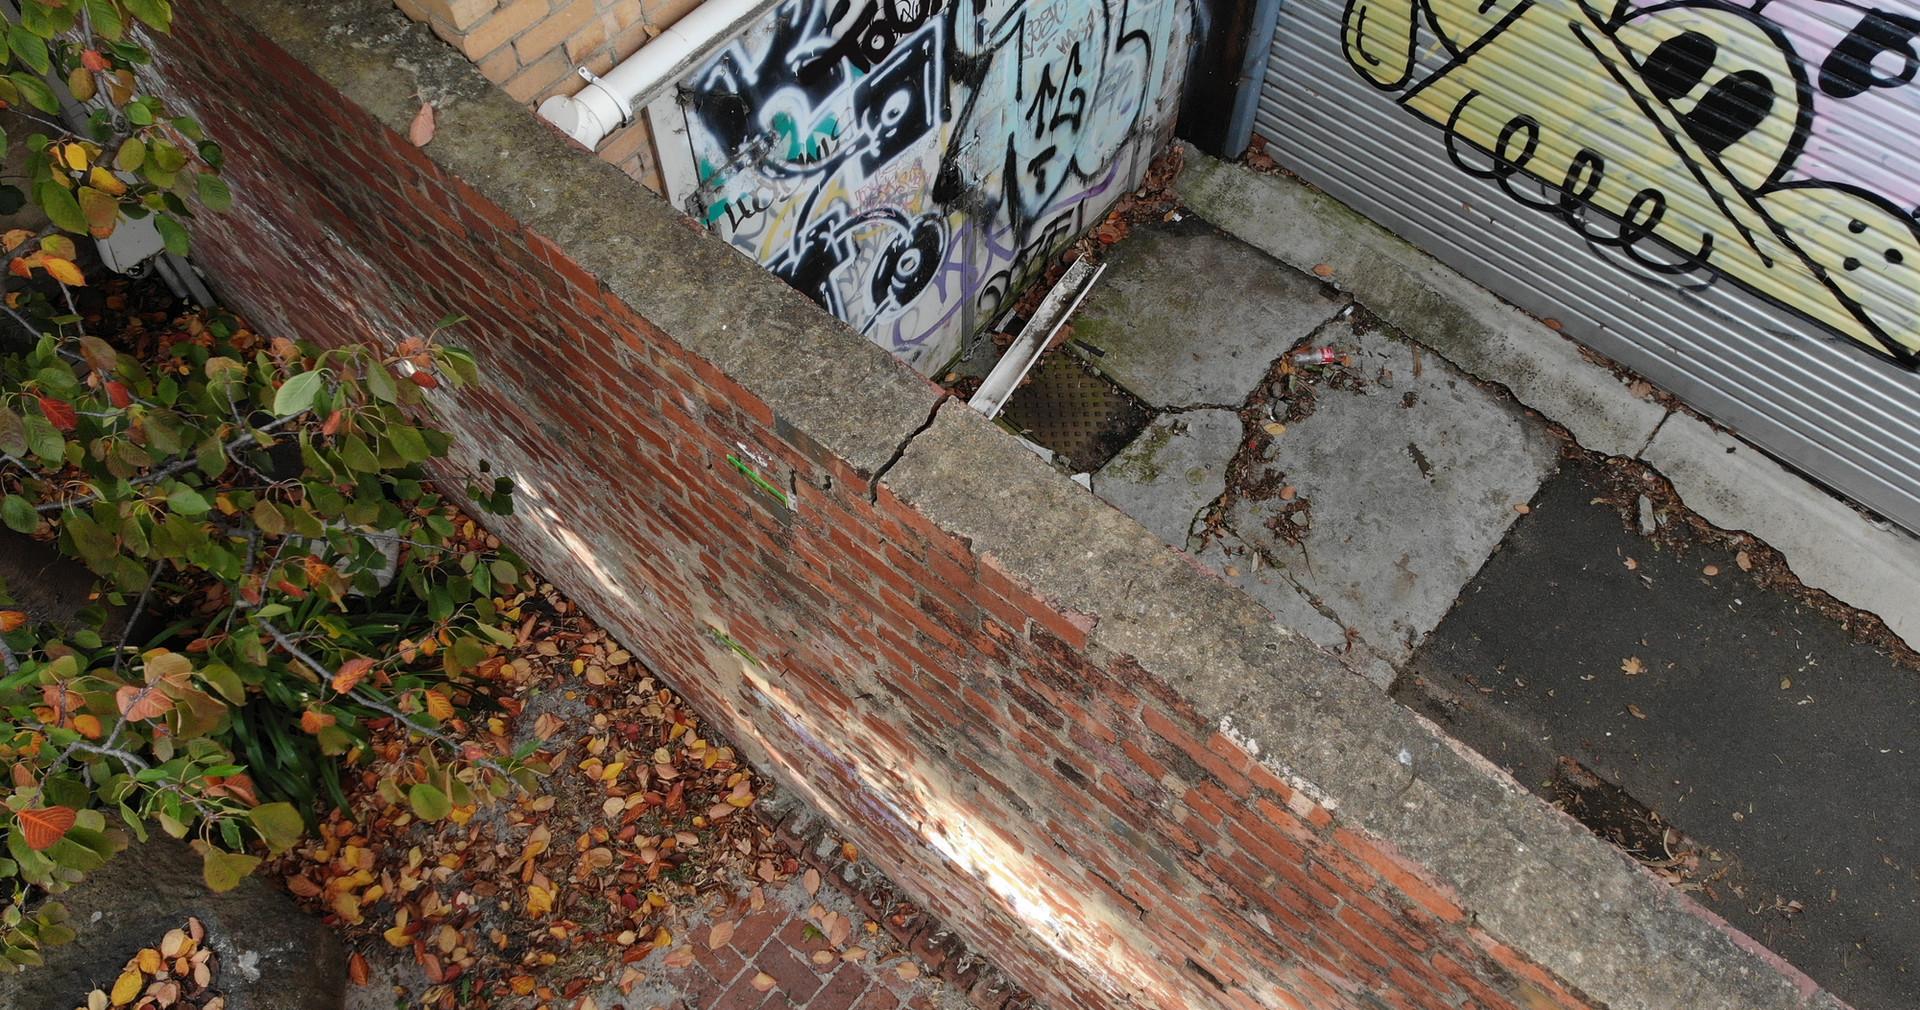 Distressed free standing brick wall.